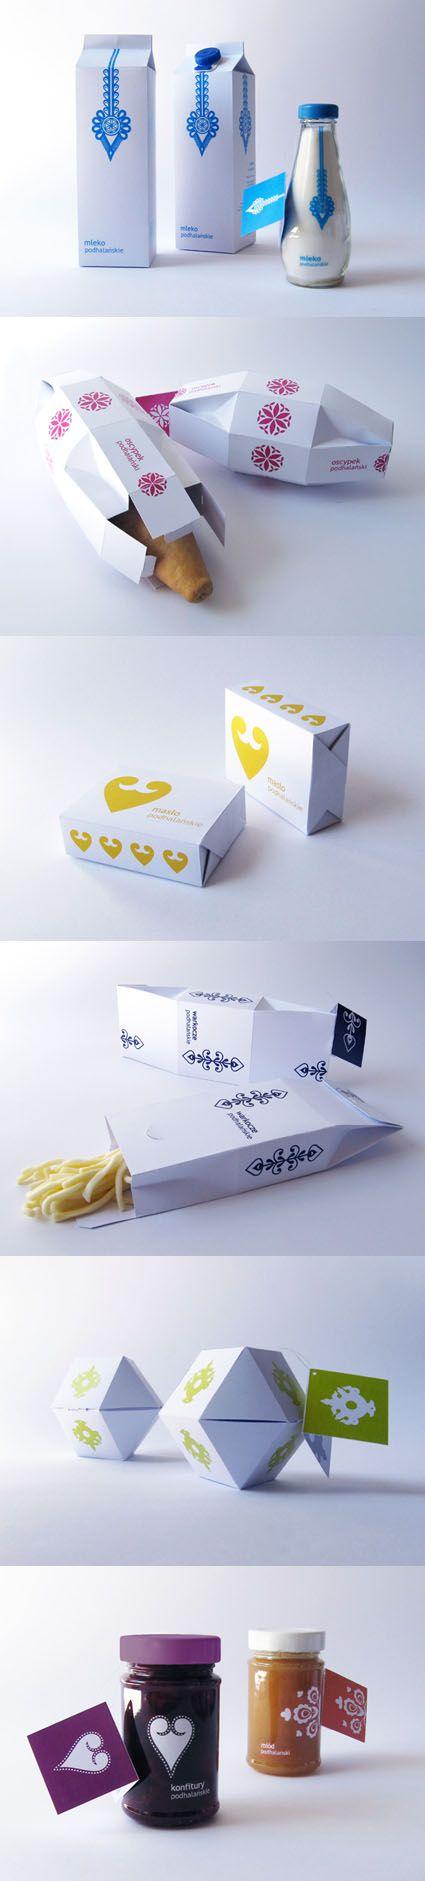 Nice designs